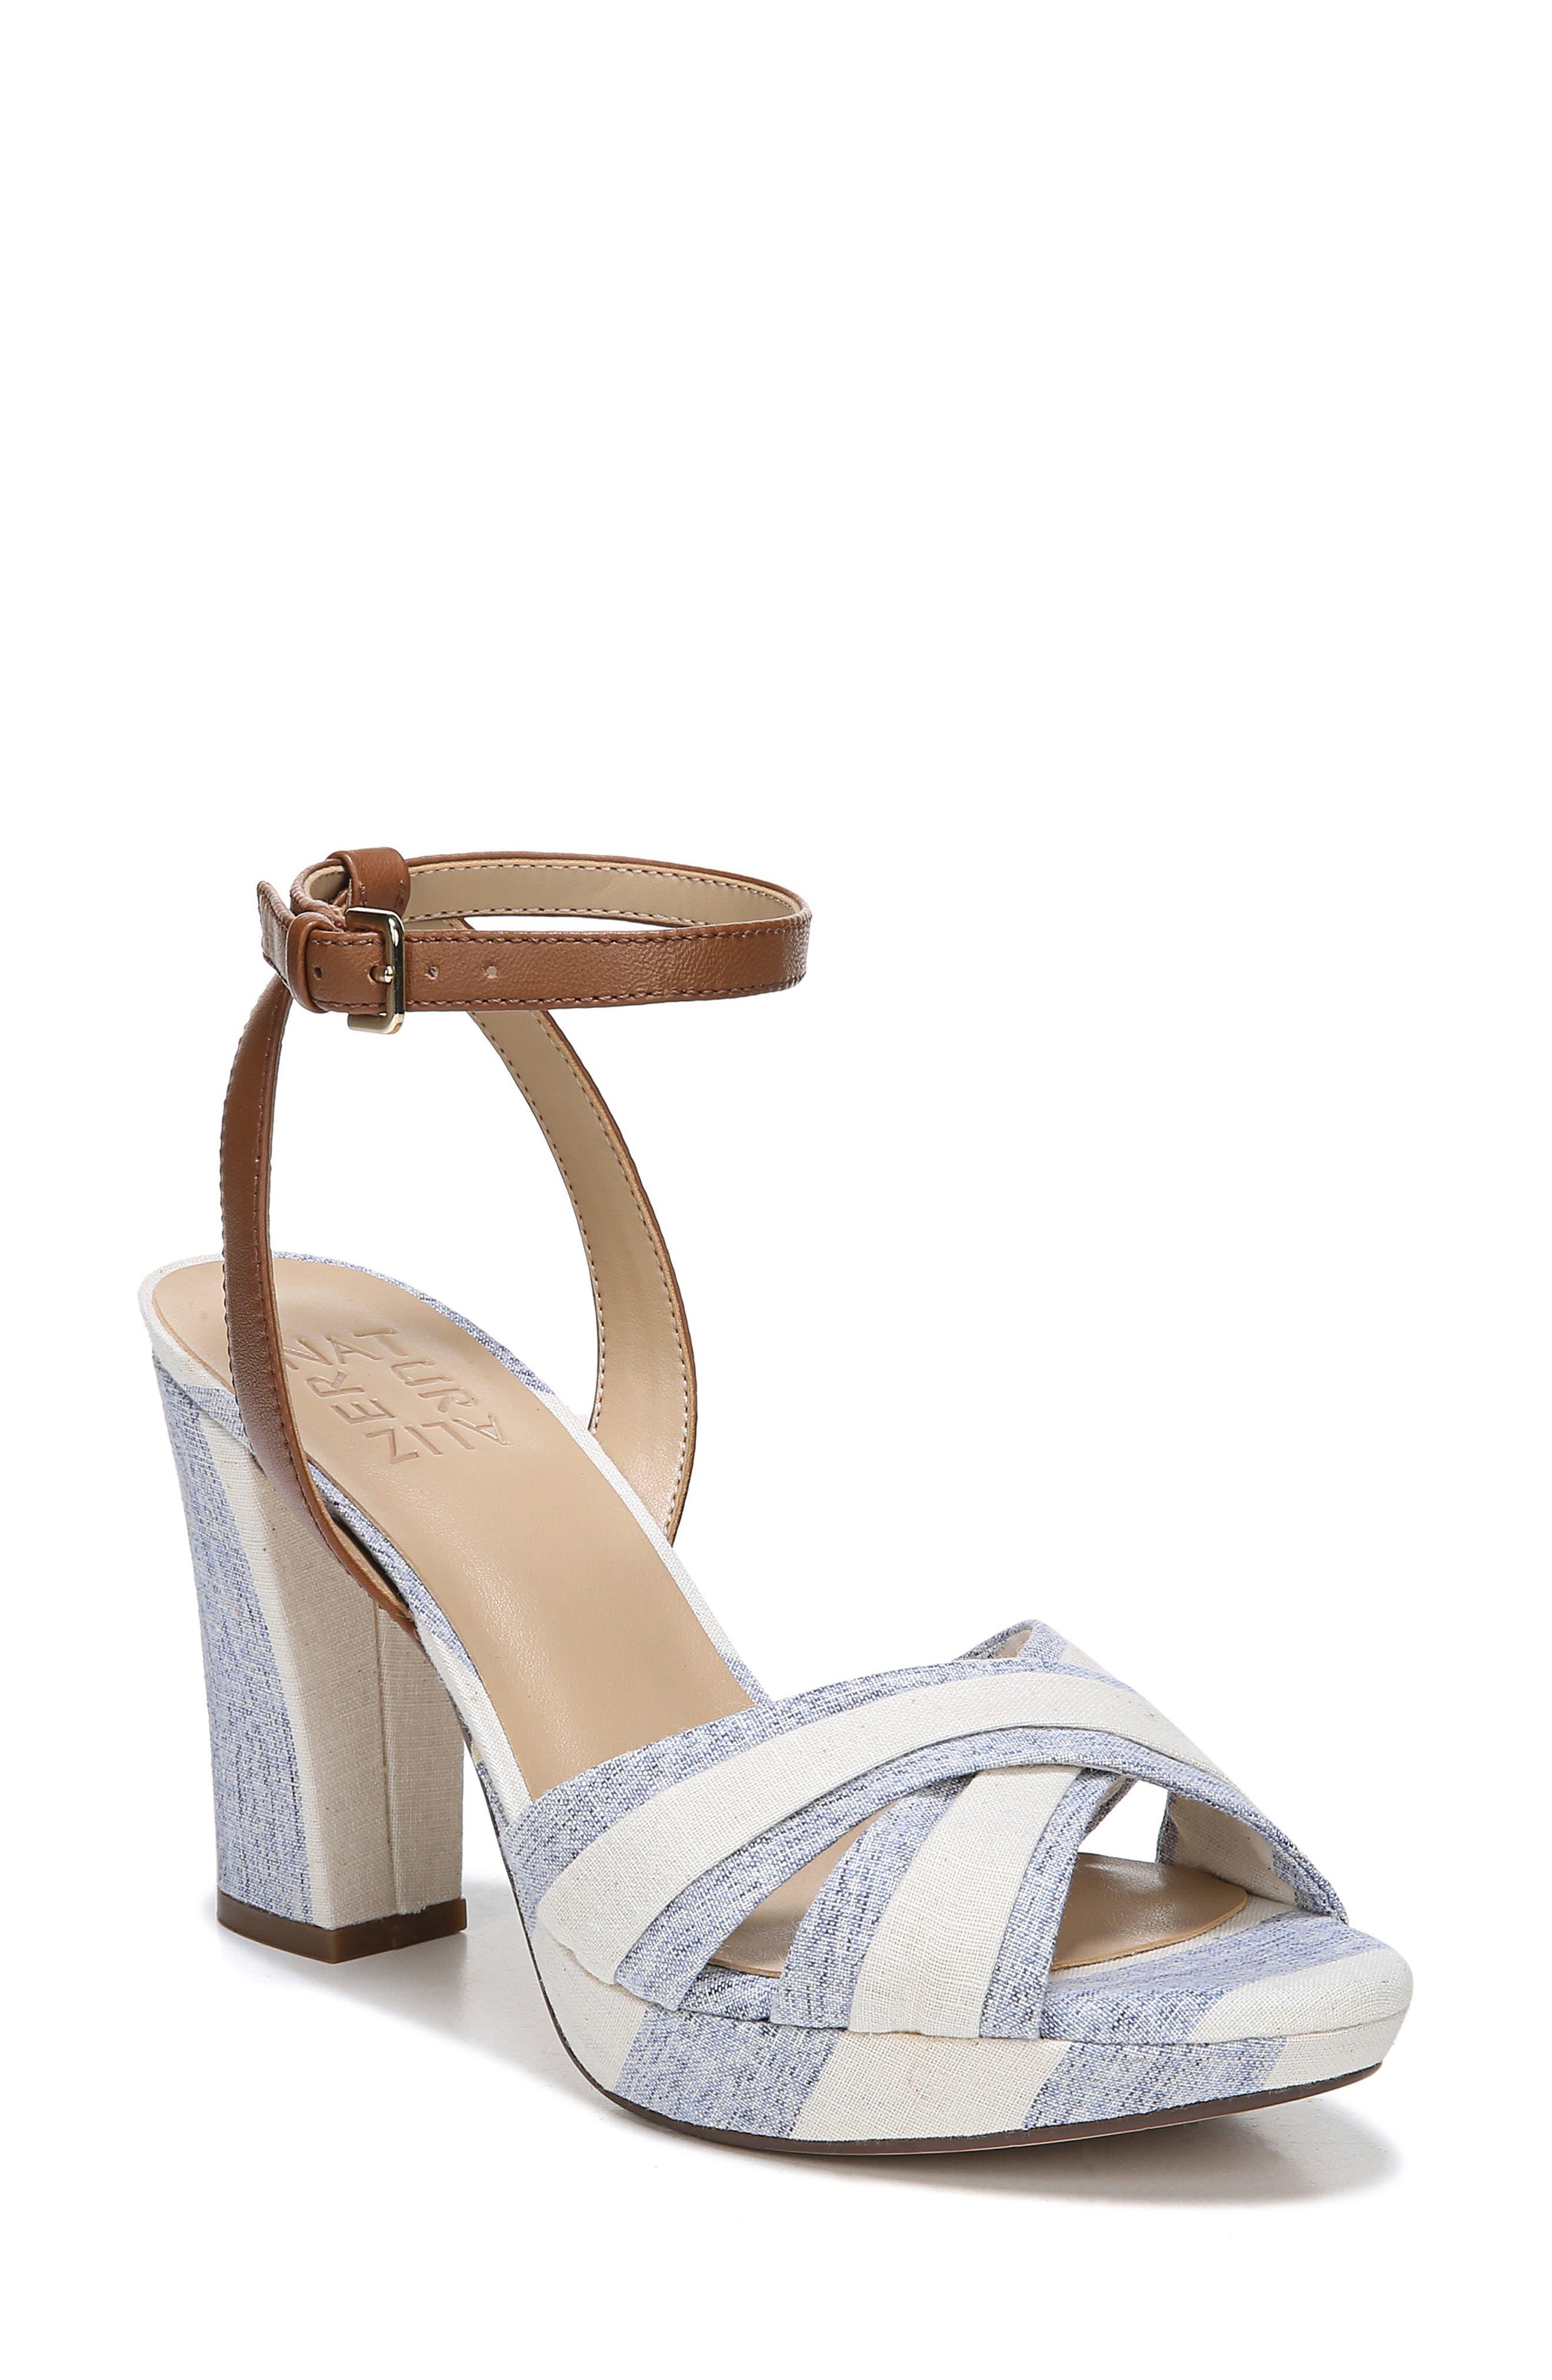 Naturalizer Avril Ankle Strap Sandal, Blue